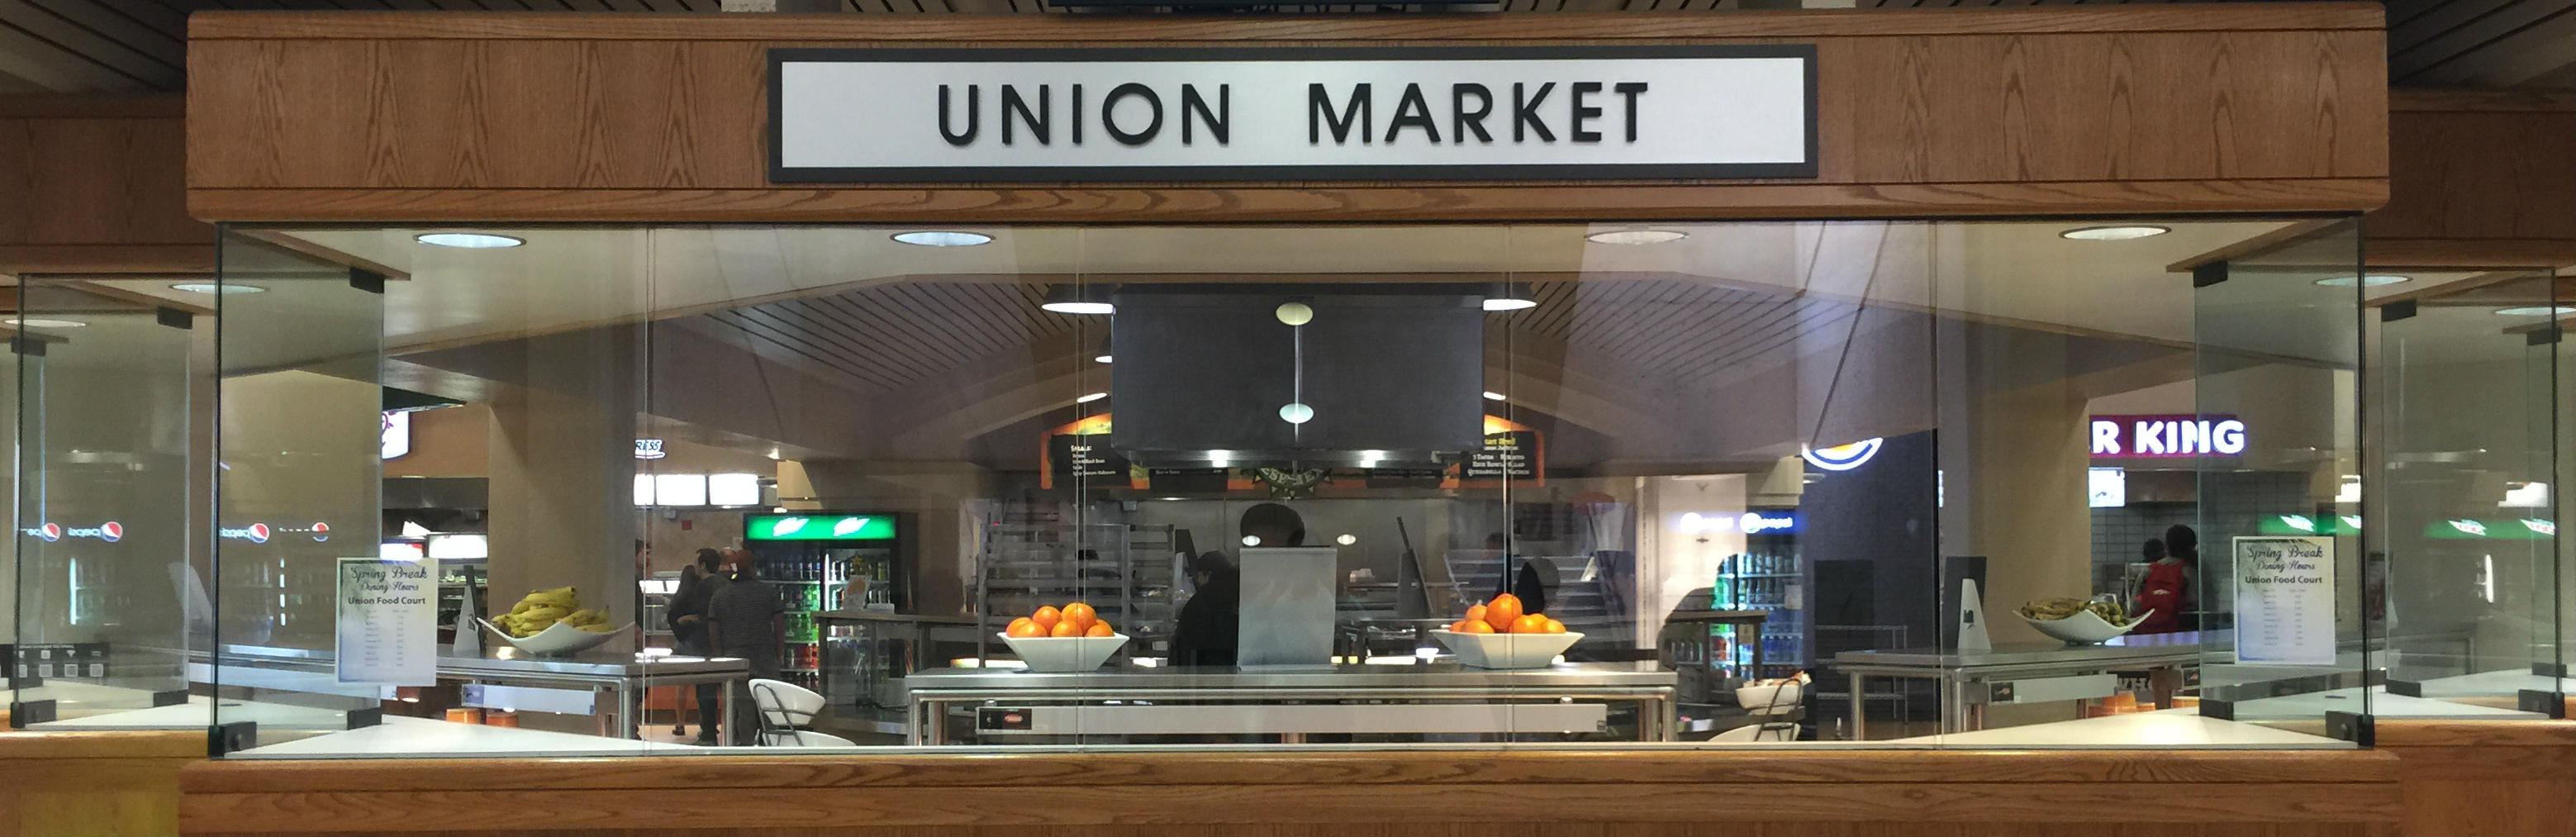 Retail and dining arkansas union university of arkansas for Arkansas cuisine